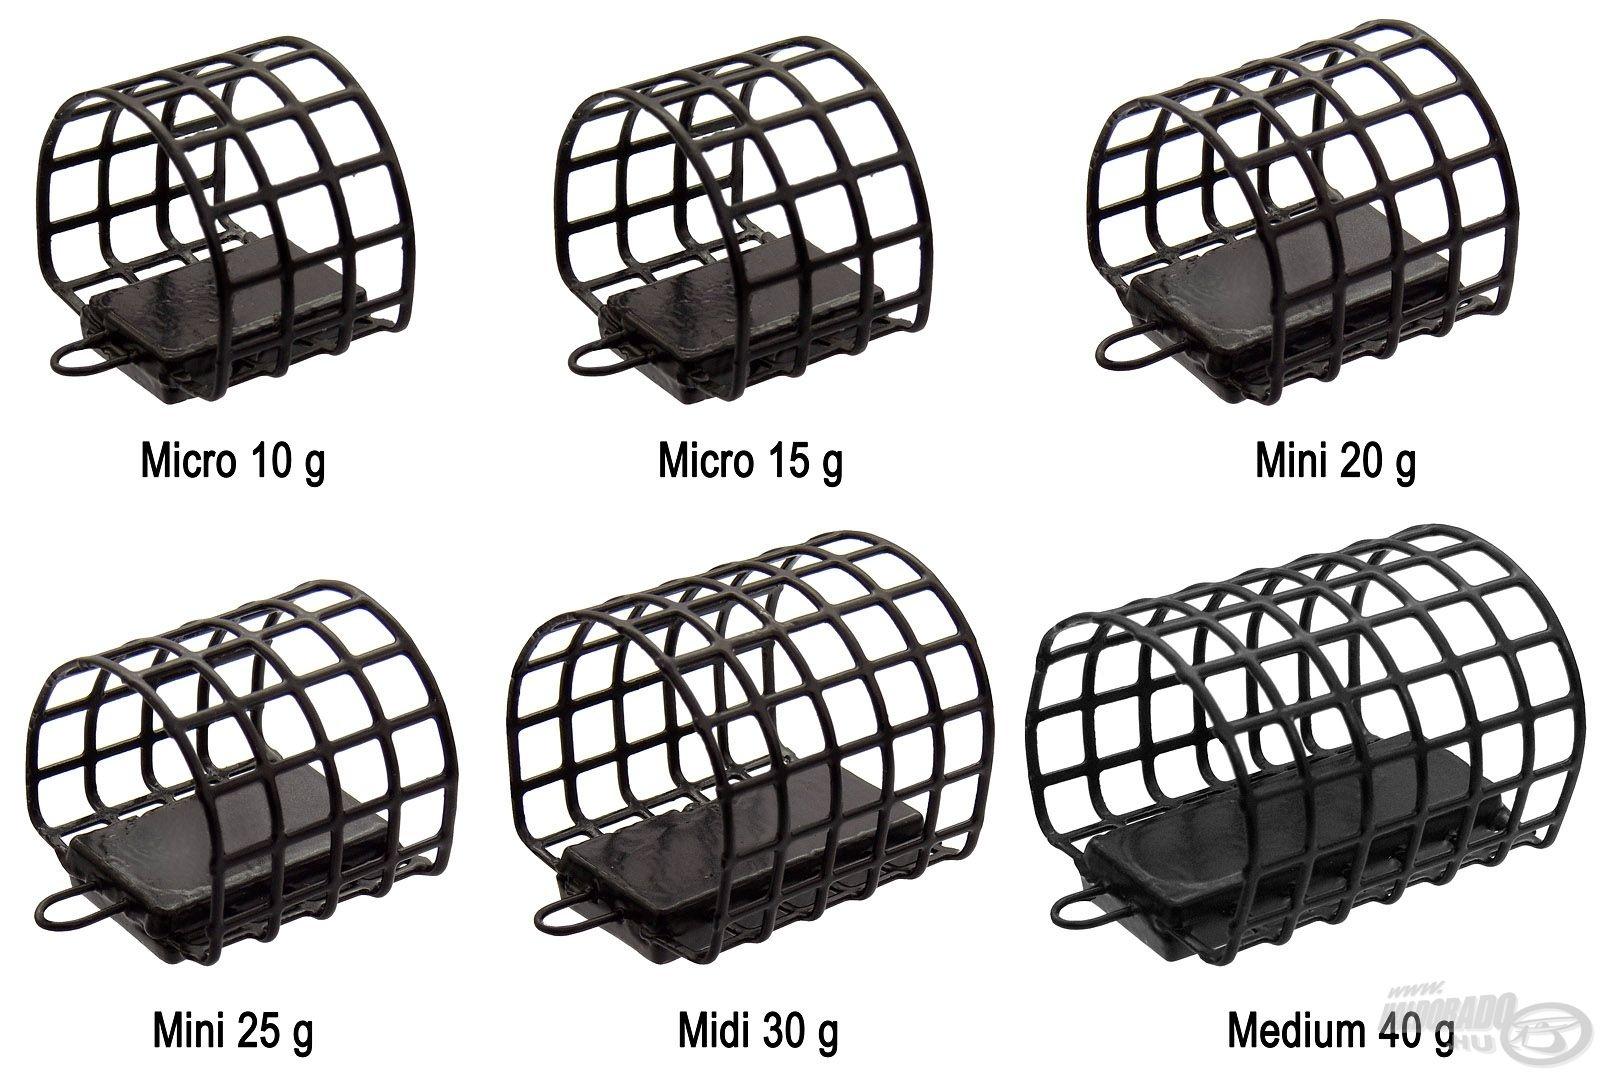 6x14 Medium Feeder 40 g